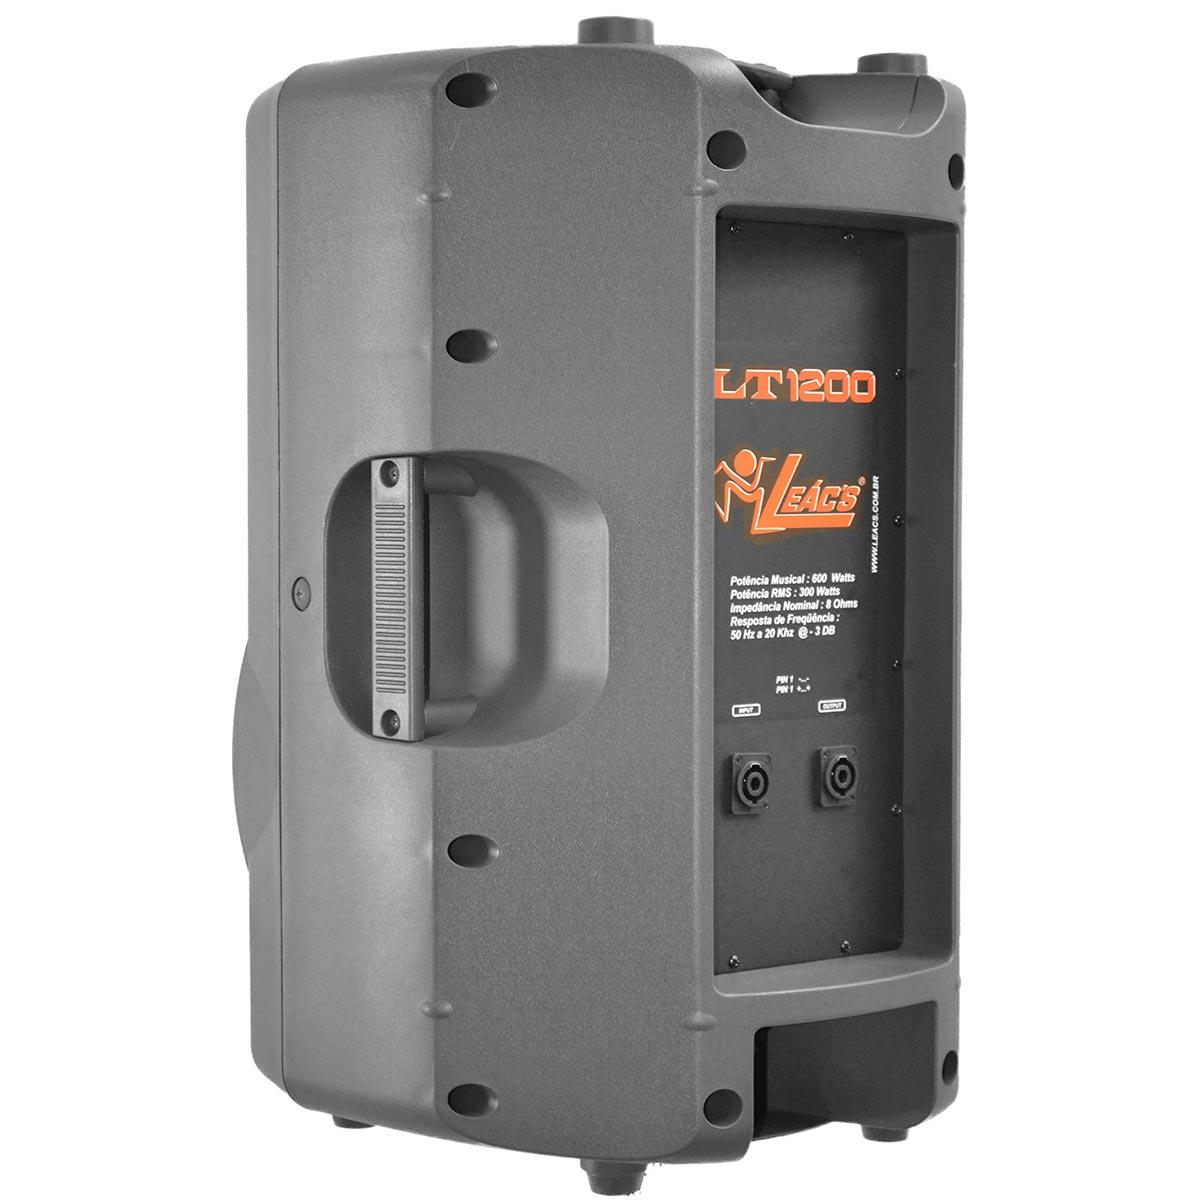 Caixa Passiva Fal 12 Pol 300W - LT 1200 Leacs